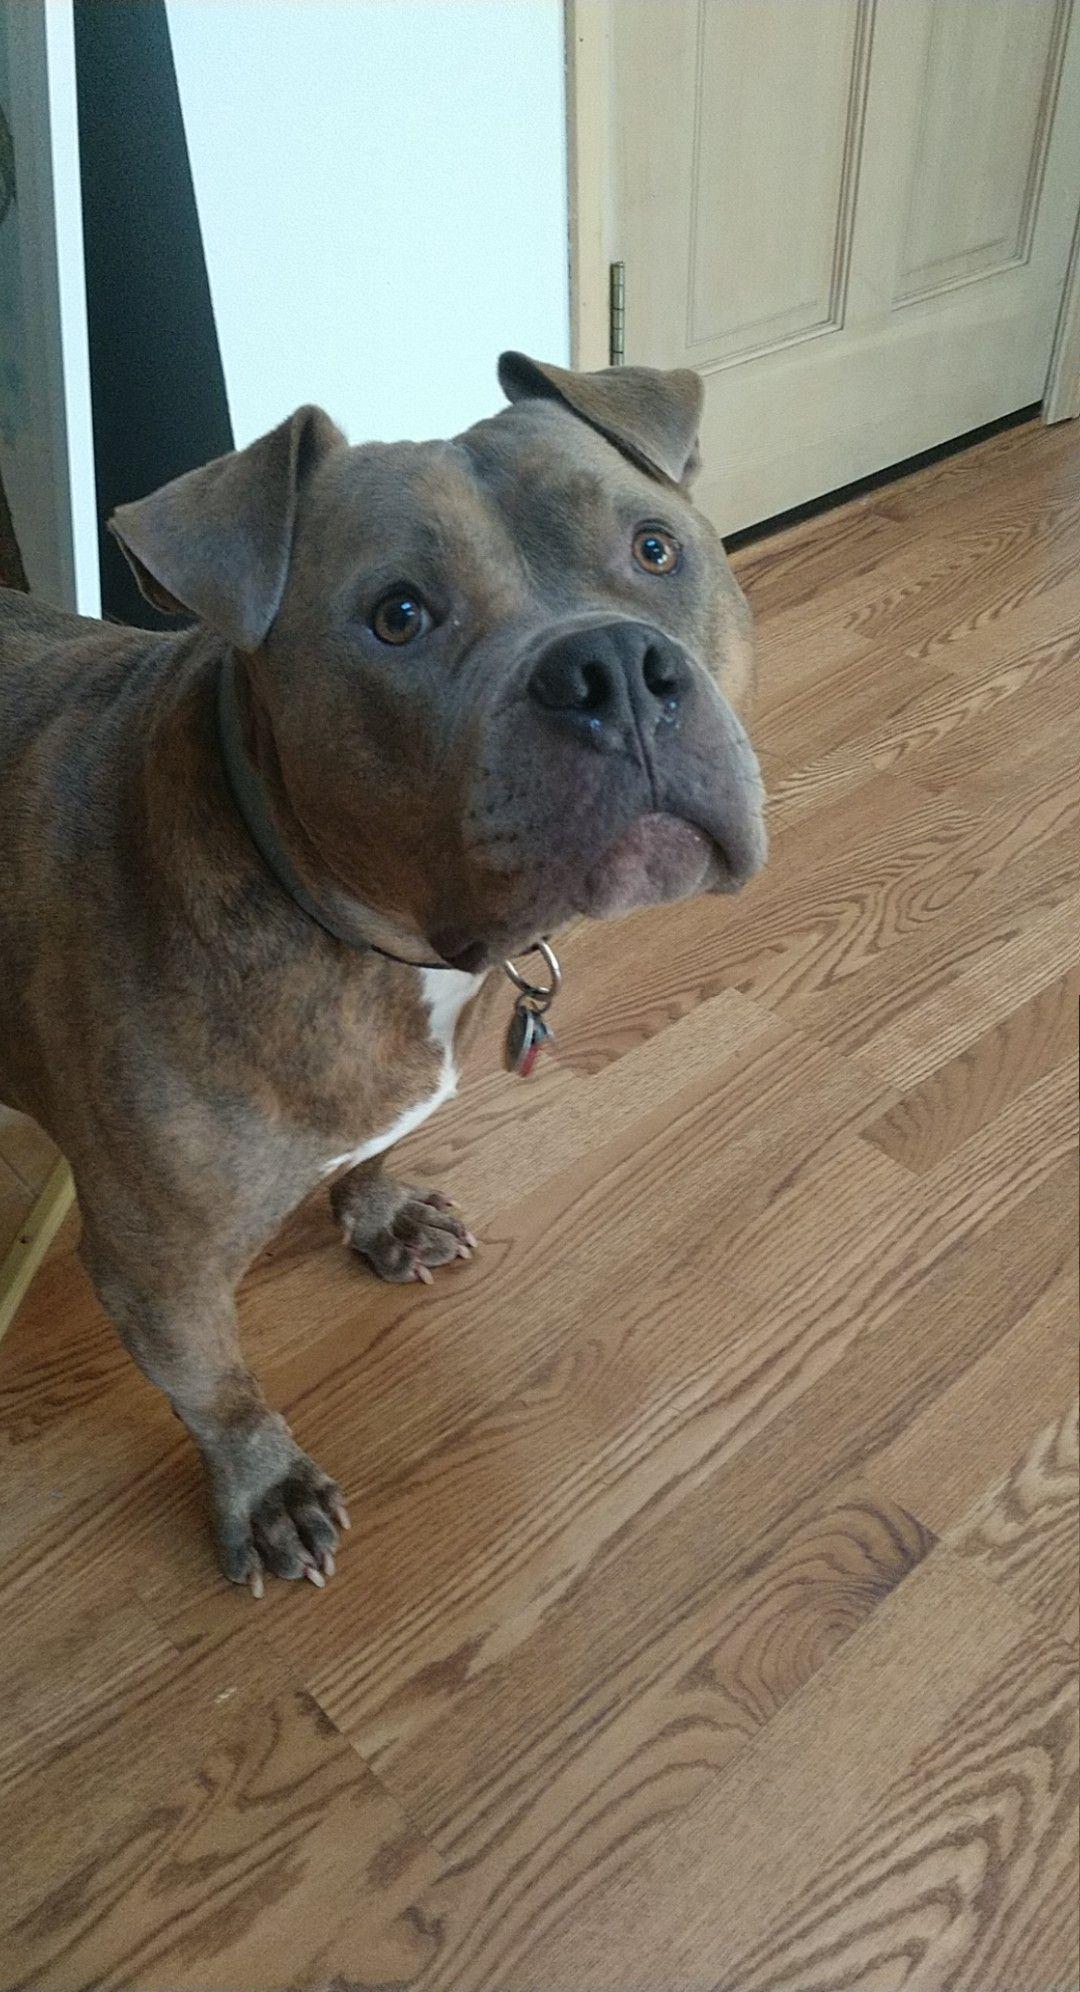 44+ Adorable Pitbull Mixed Breeds | Facts & Pics | Doggypedia -   - #adorable #breeds #DogLovers #doggypedia #DogsandPuppies #facts #mixed #Pics #pitbull